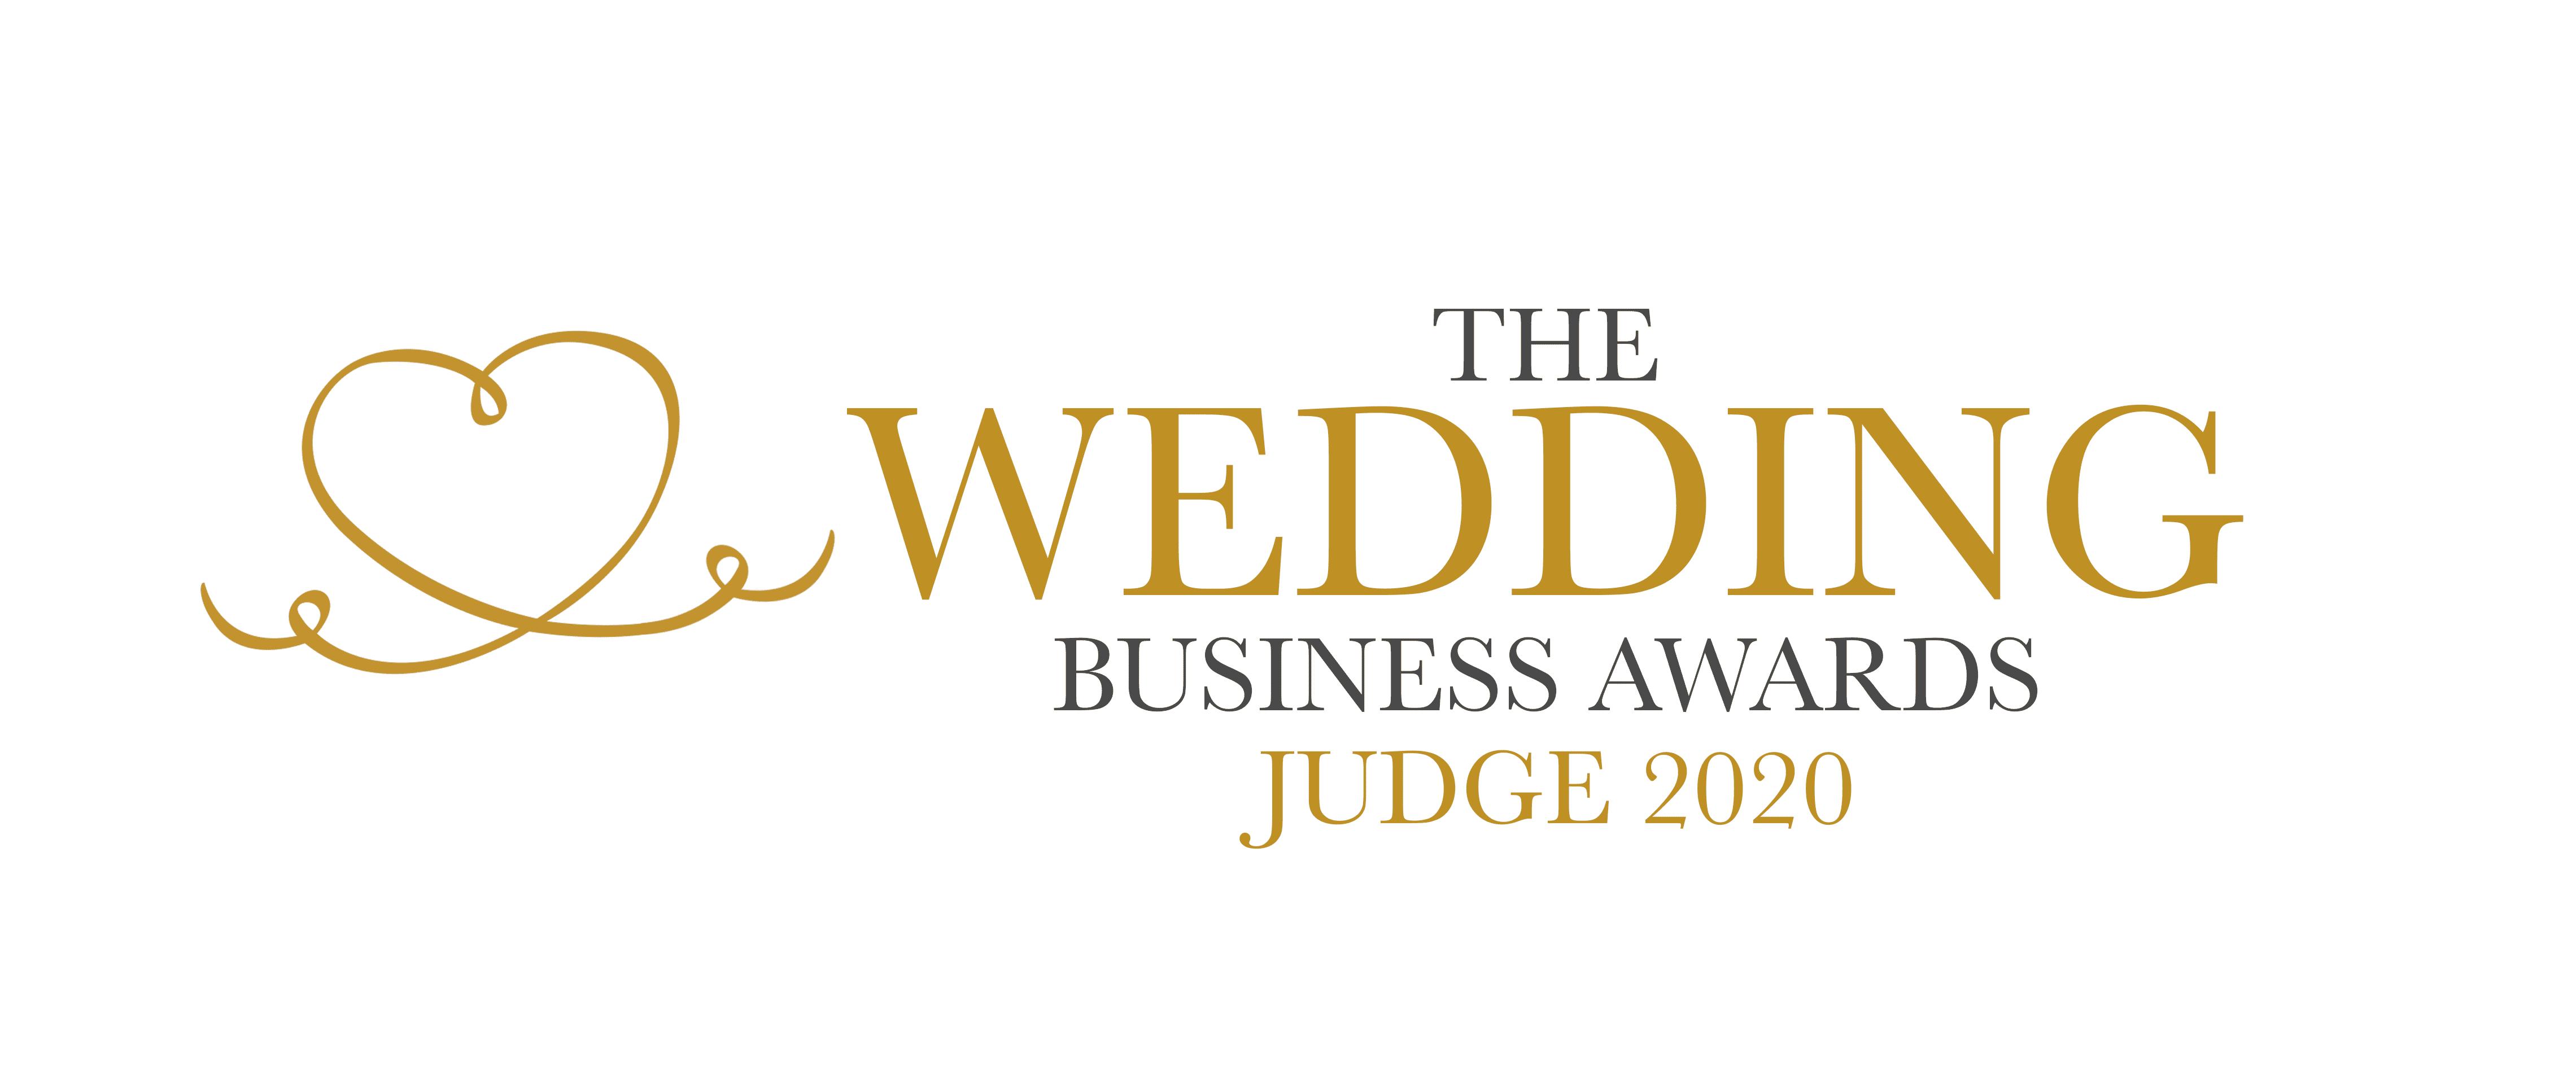 The Wedding Business Awards 2020